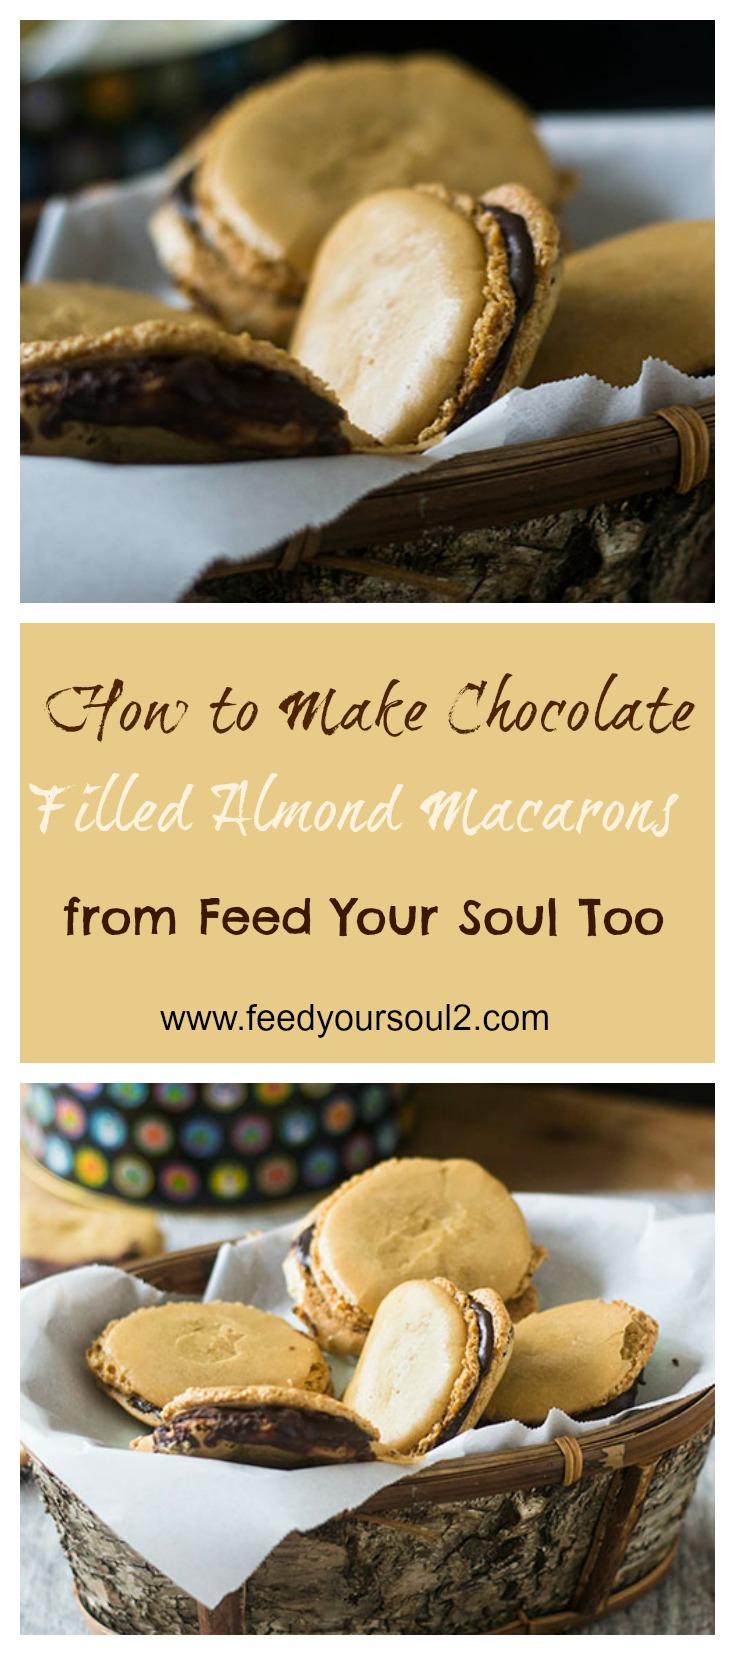 Chocolate Filled Almond Macarons #glutenfree #cookies #dessert   feedyoursoul2.com